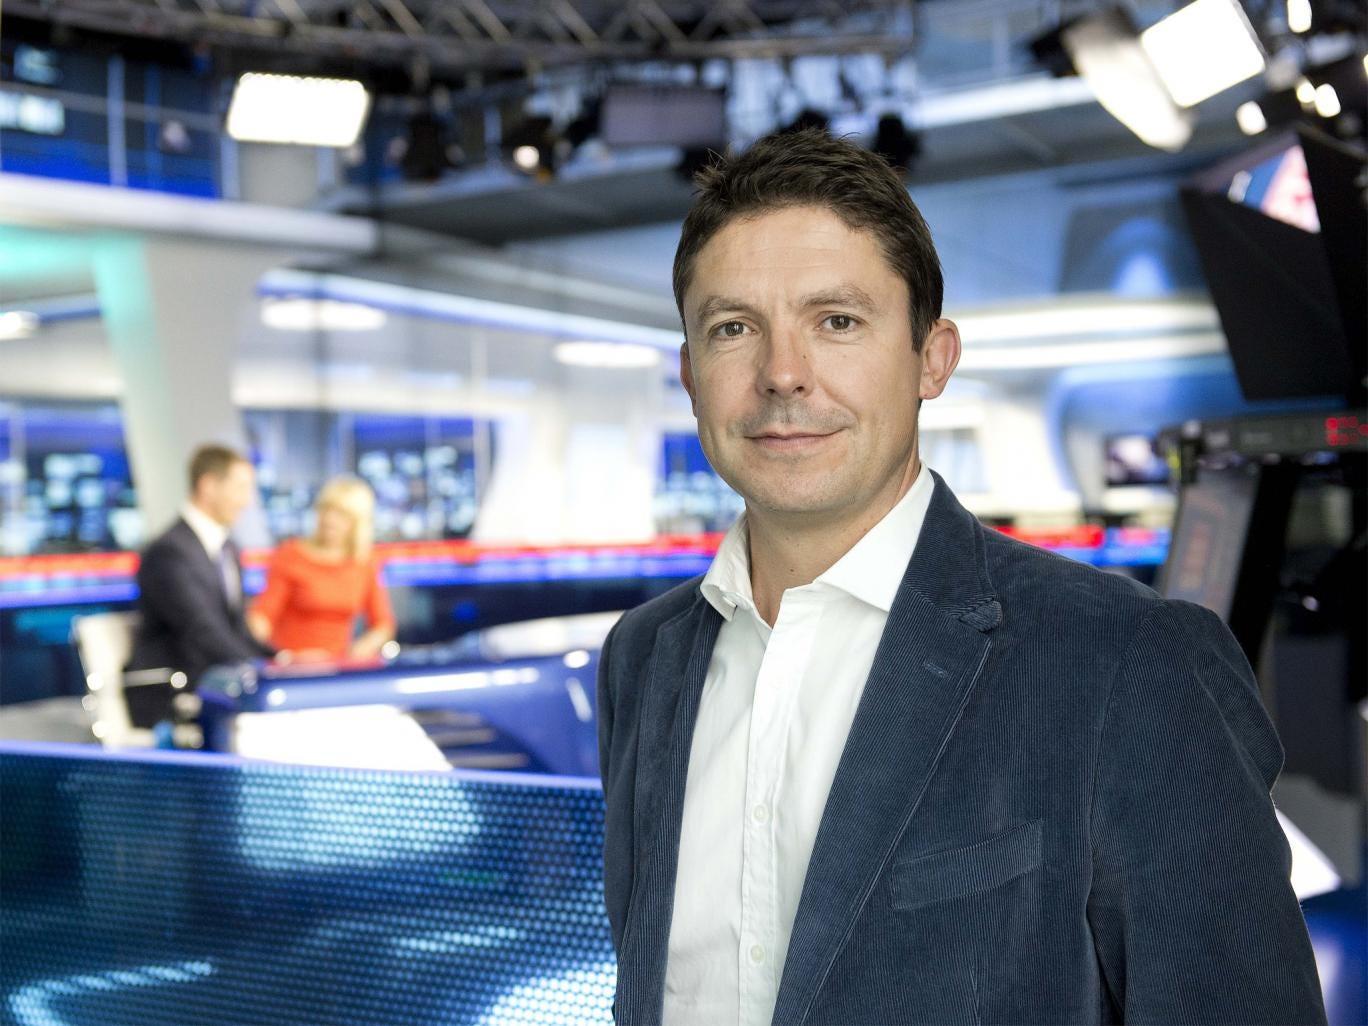 Sky Sports managing director Barney Francis down on the studio floor